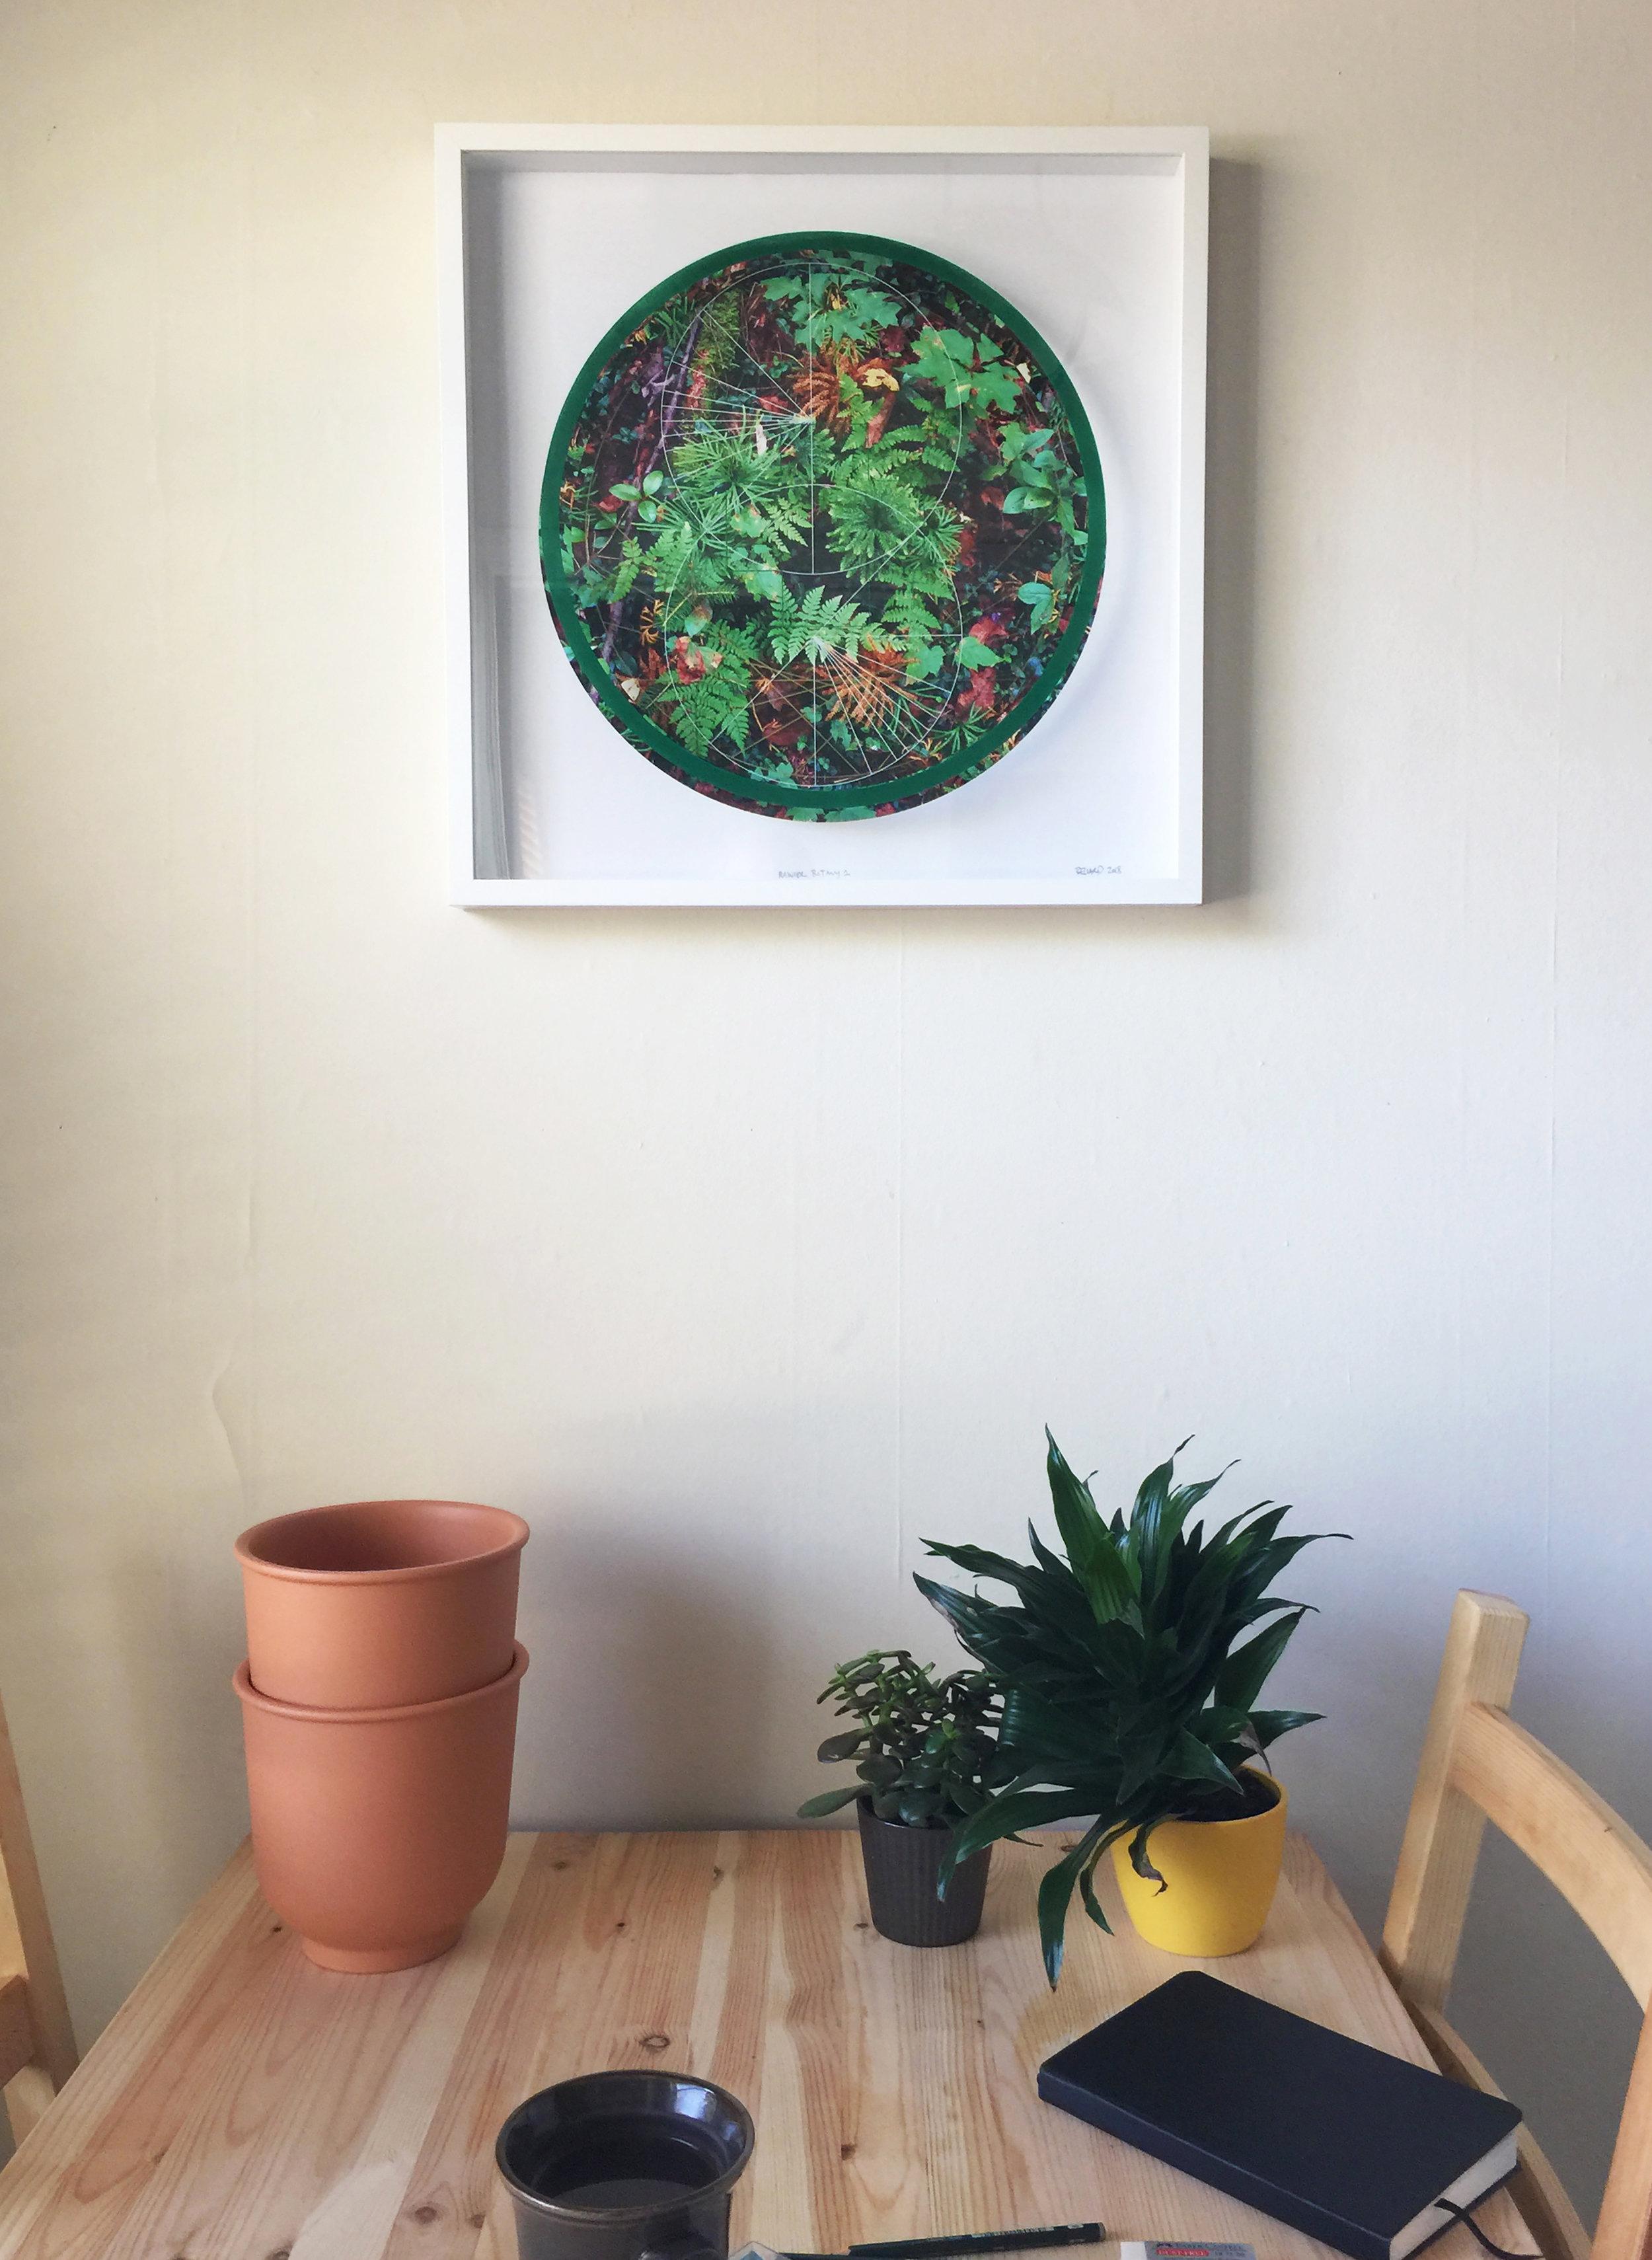 Rainier Botany 1 on wall.jpg